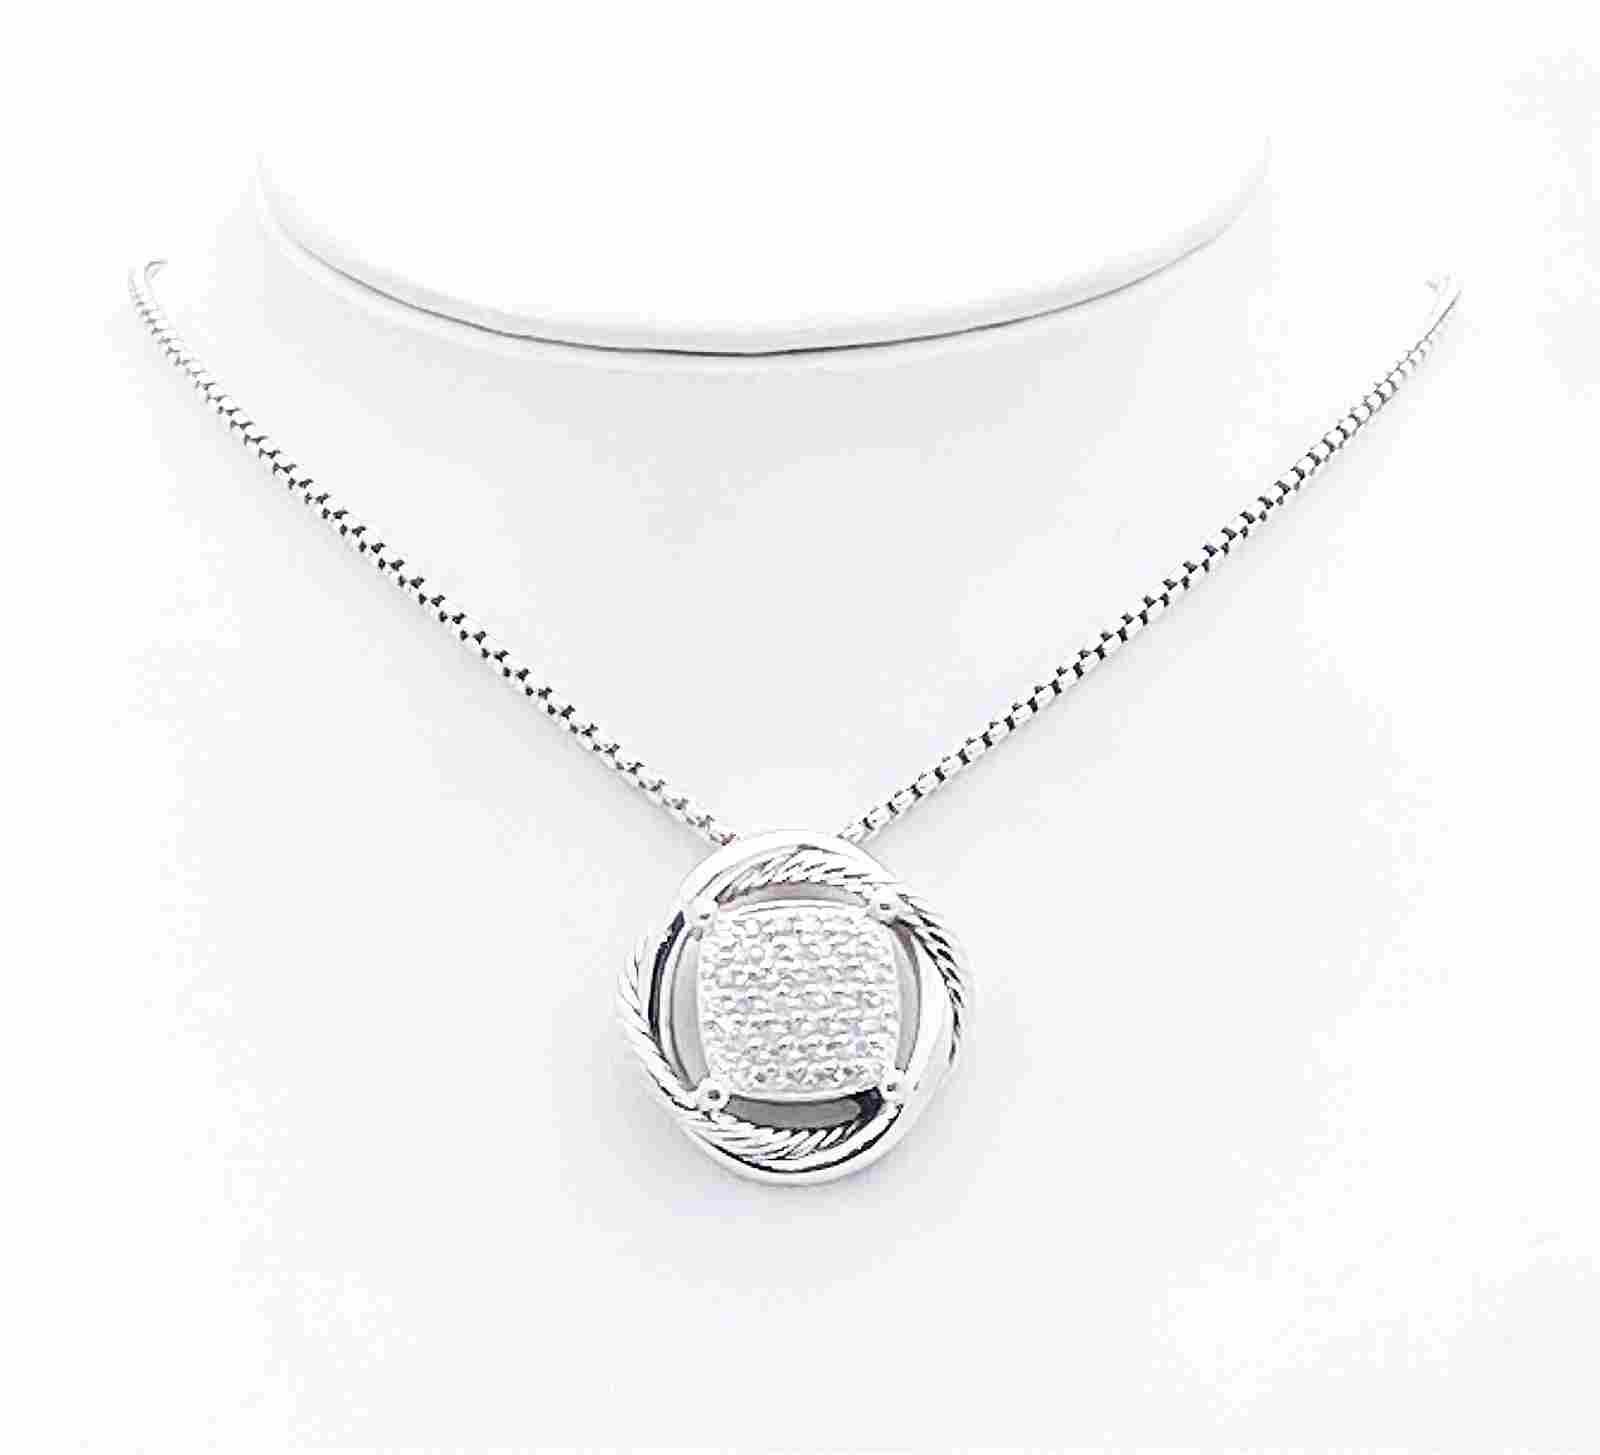 DAVID YURMAN  DIAMOND 925 INFINITY PENDANT NECKLACE